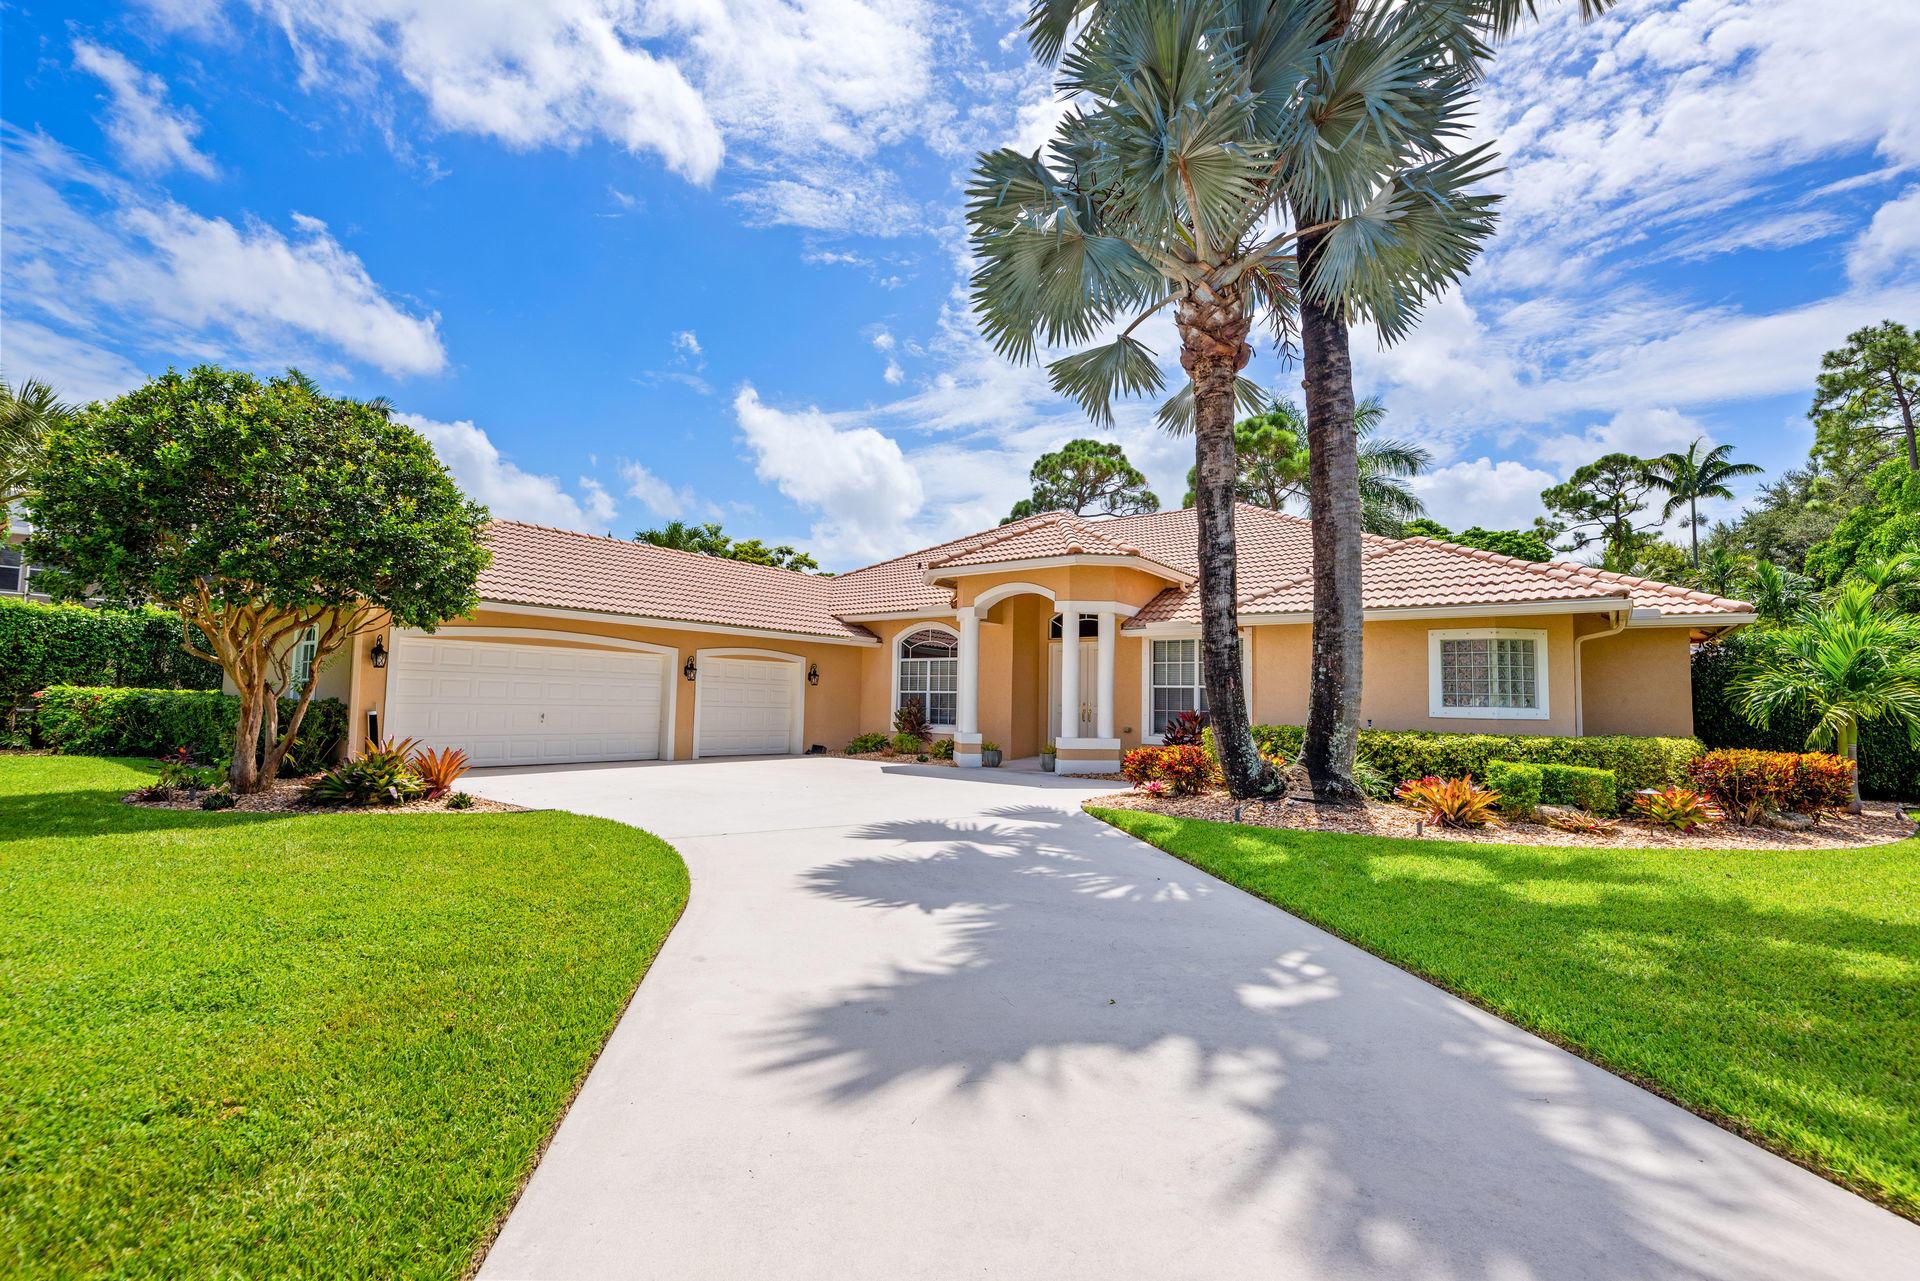 12785 Cocoa Pine Drive Boynton Beach, FL 33436